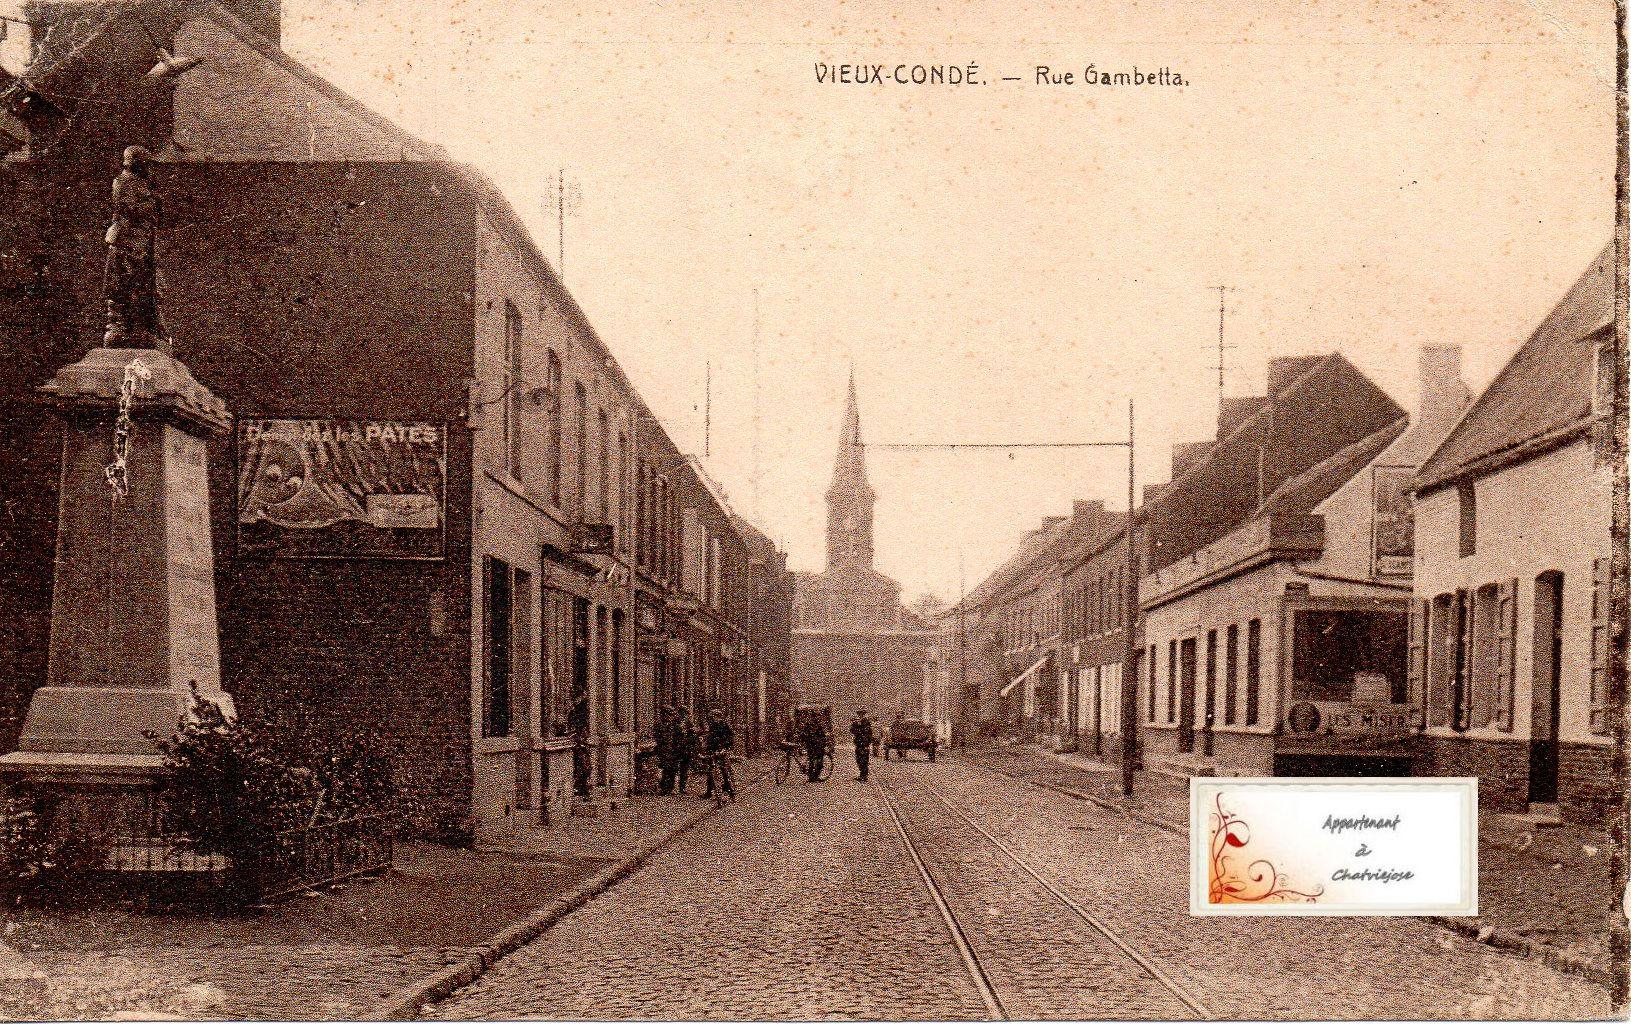 Rue Gambetta Vieux-condeA- 167.jpg